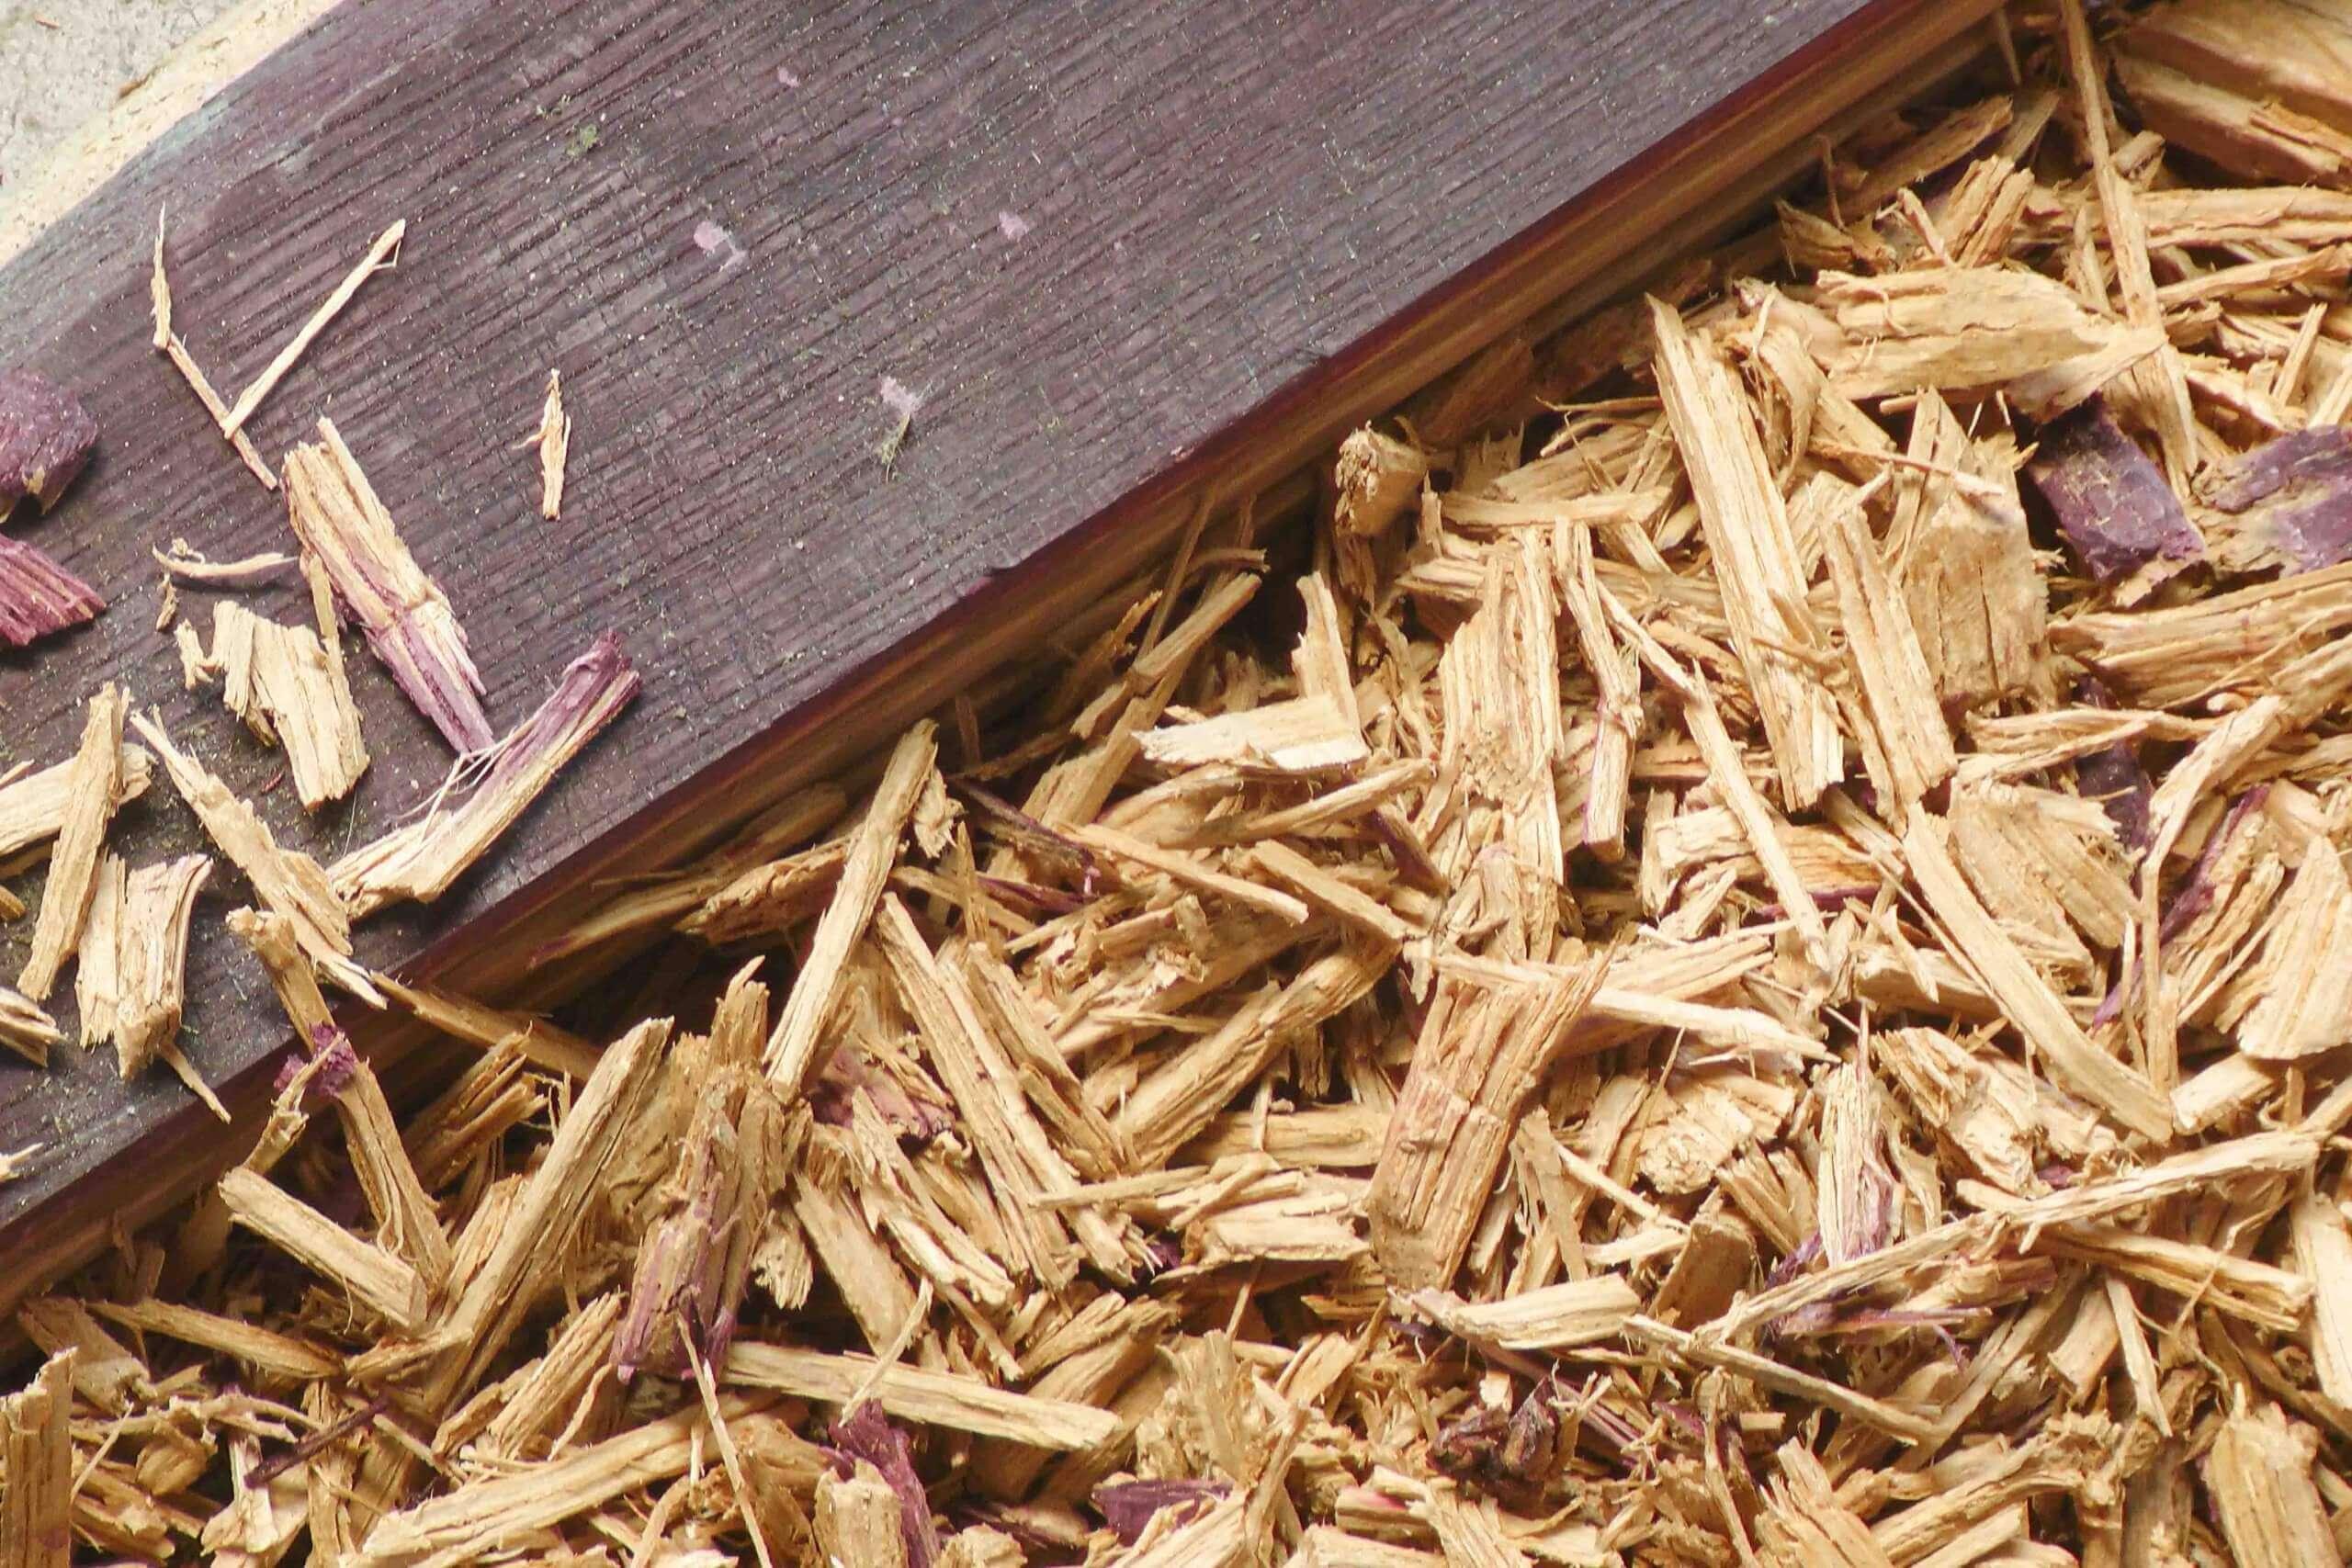 Wood scrap from old wine barrel lids